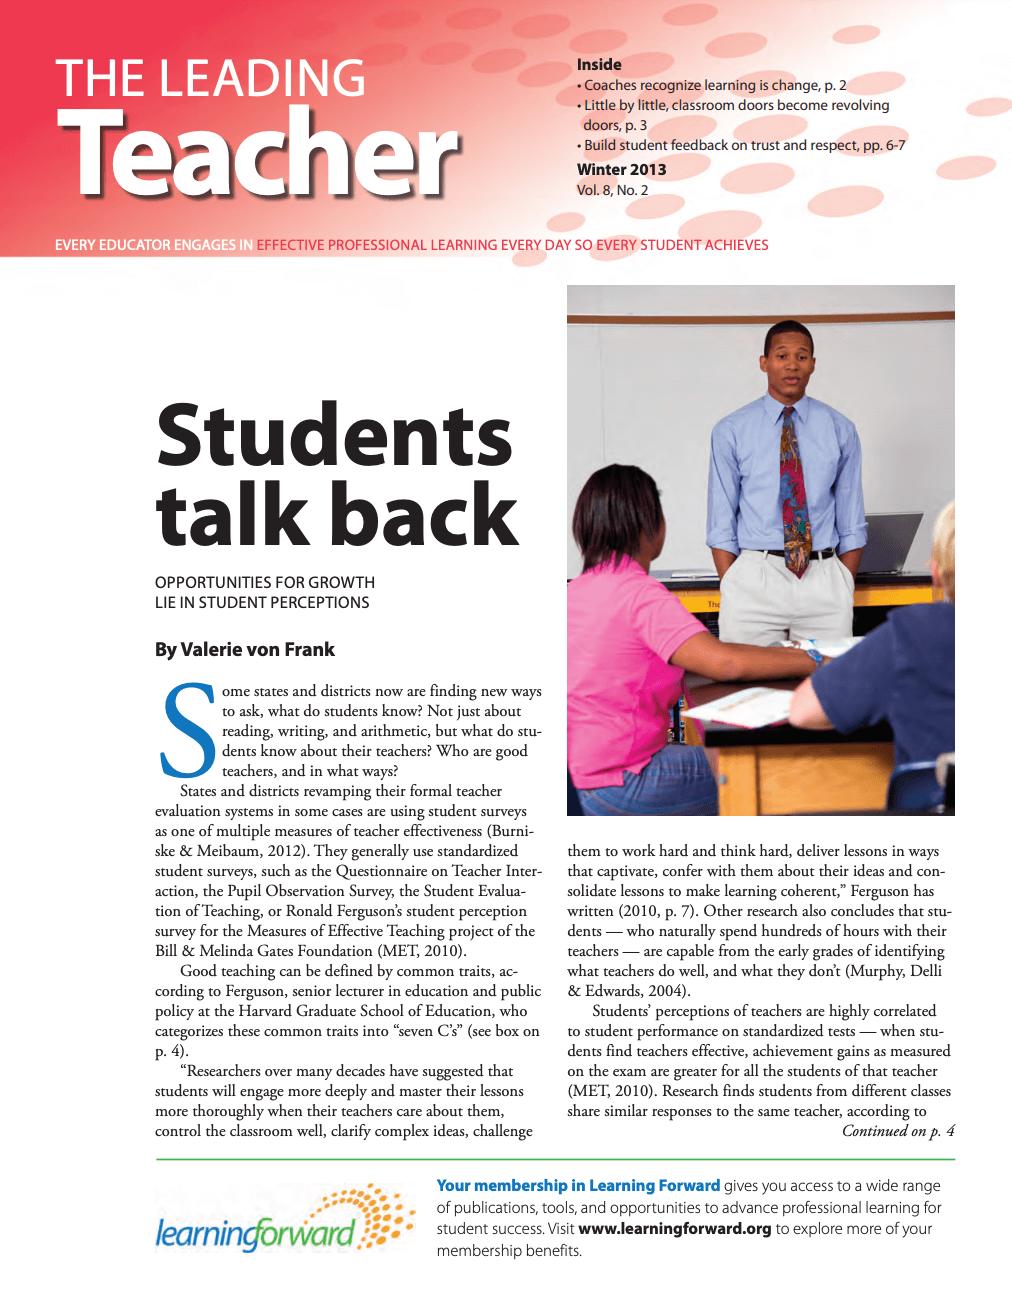 the-leading-teacher-winter-2013-vol-8-no-2